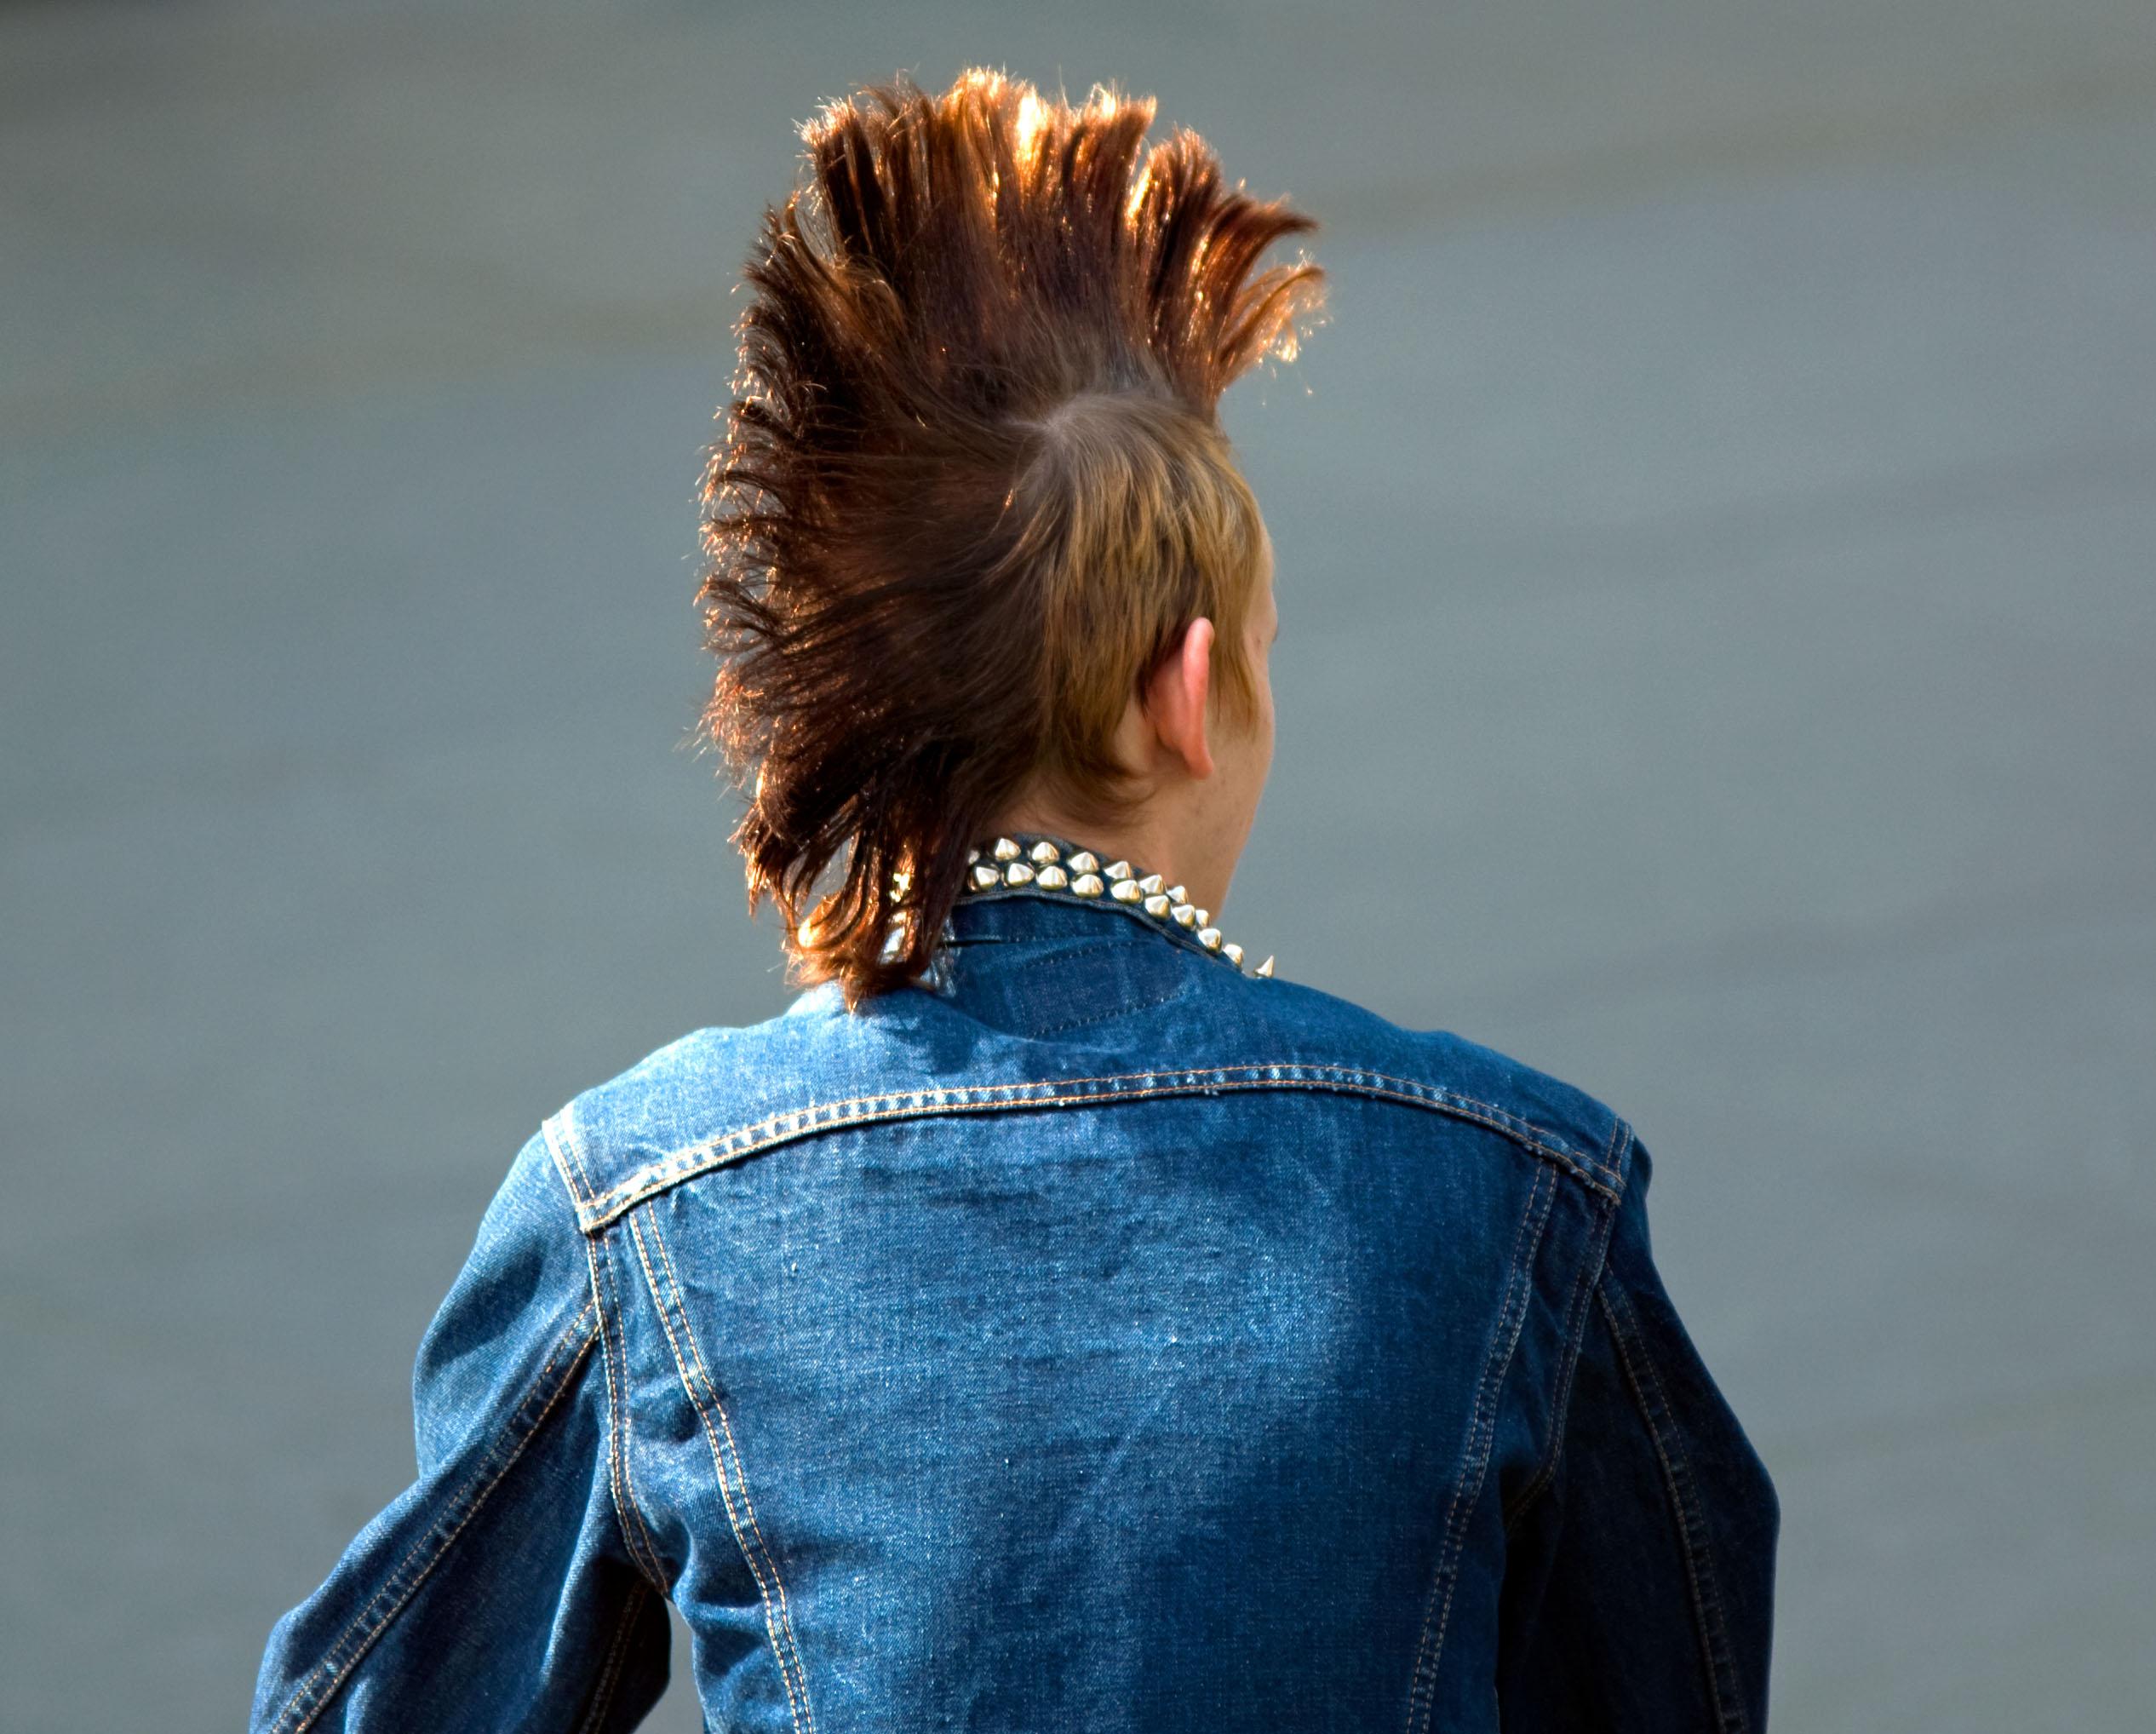 Security Haircut : Cyber Security ? More than Just a Bad Hair Cut Telos Media Center